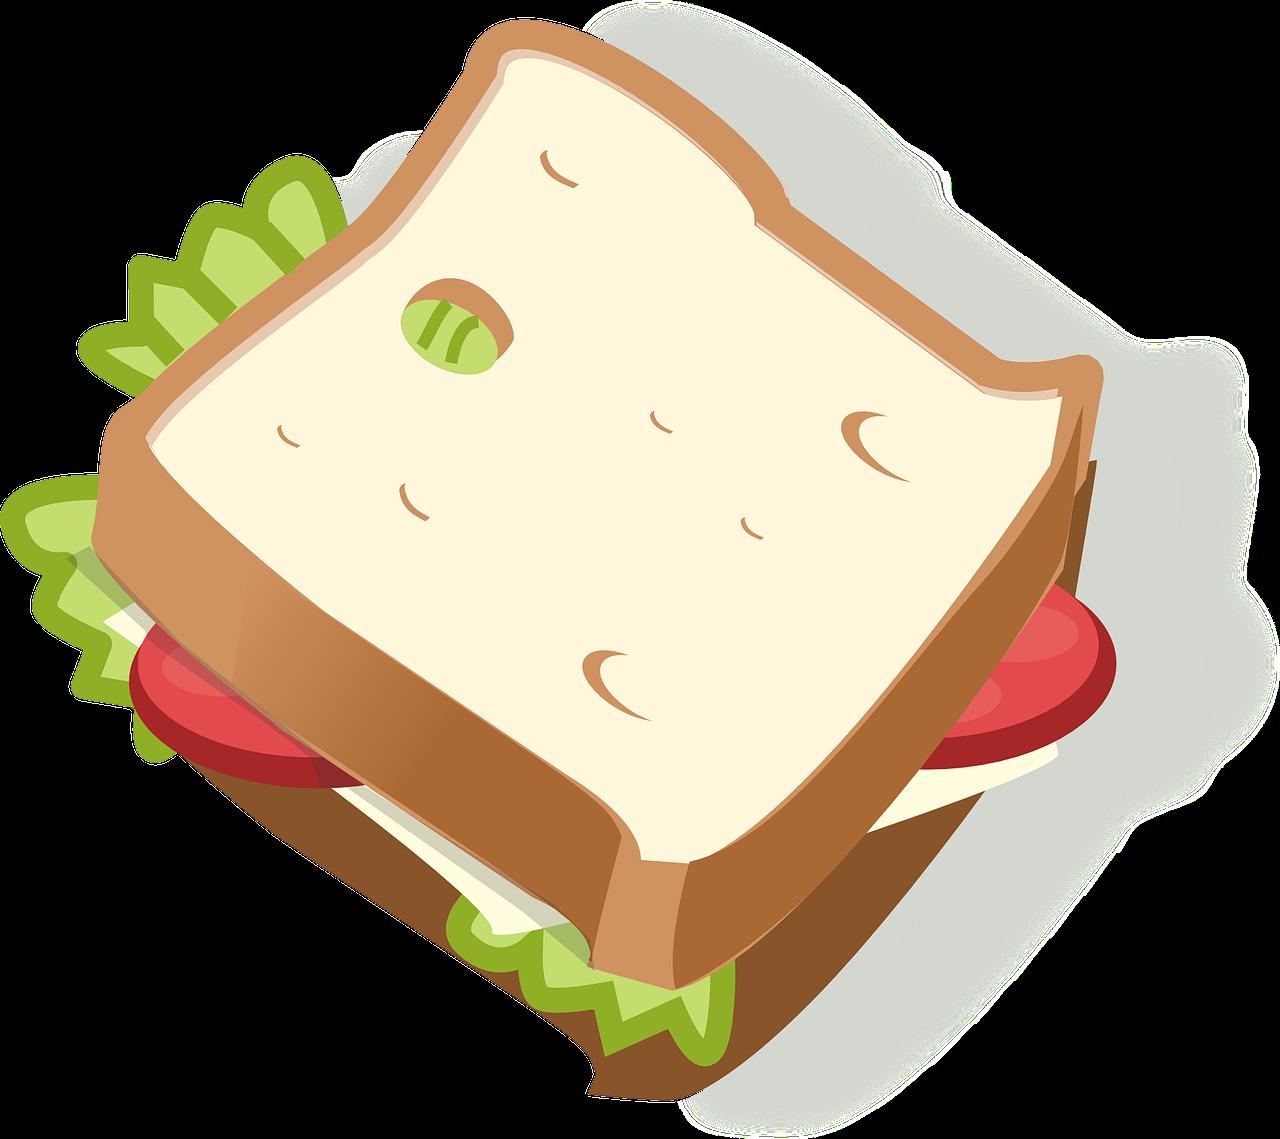 Katie cupcake cymru the. Clipart lunch sandwich lunch